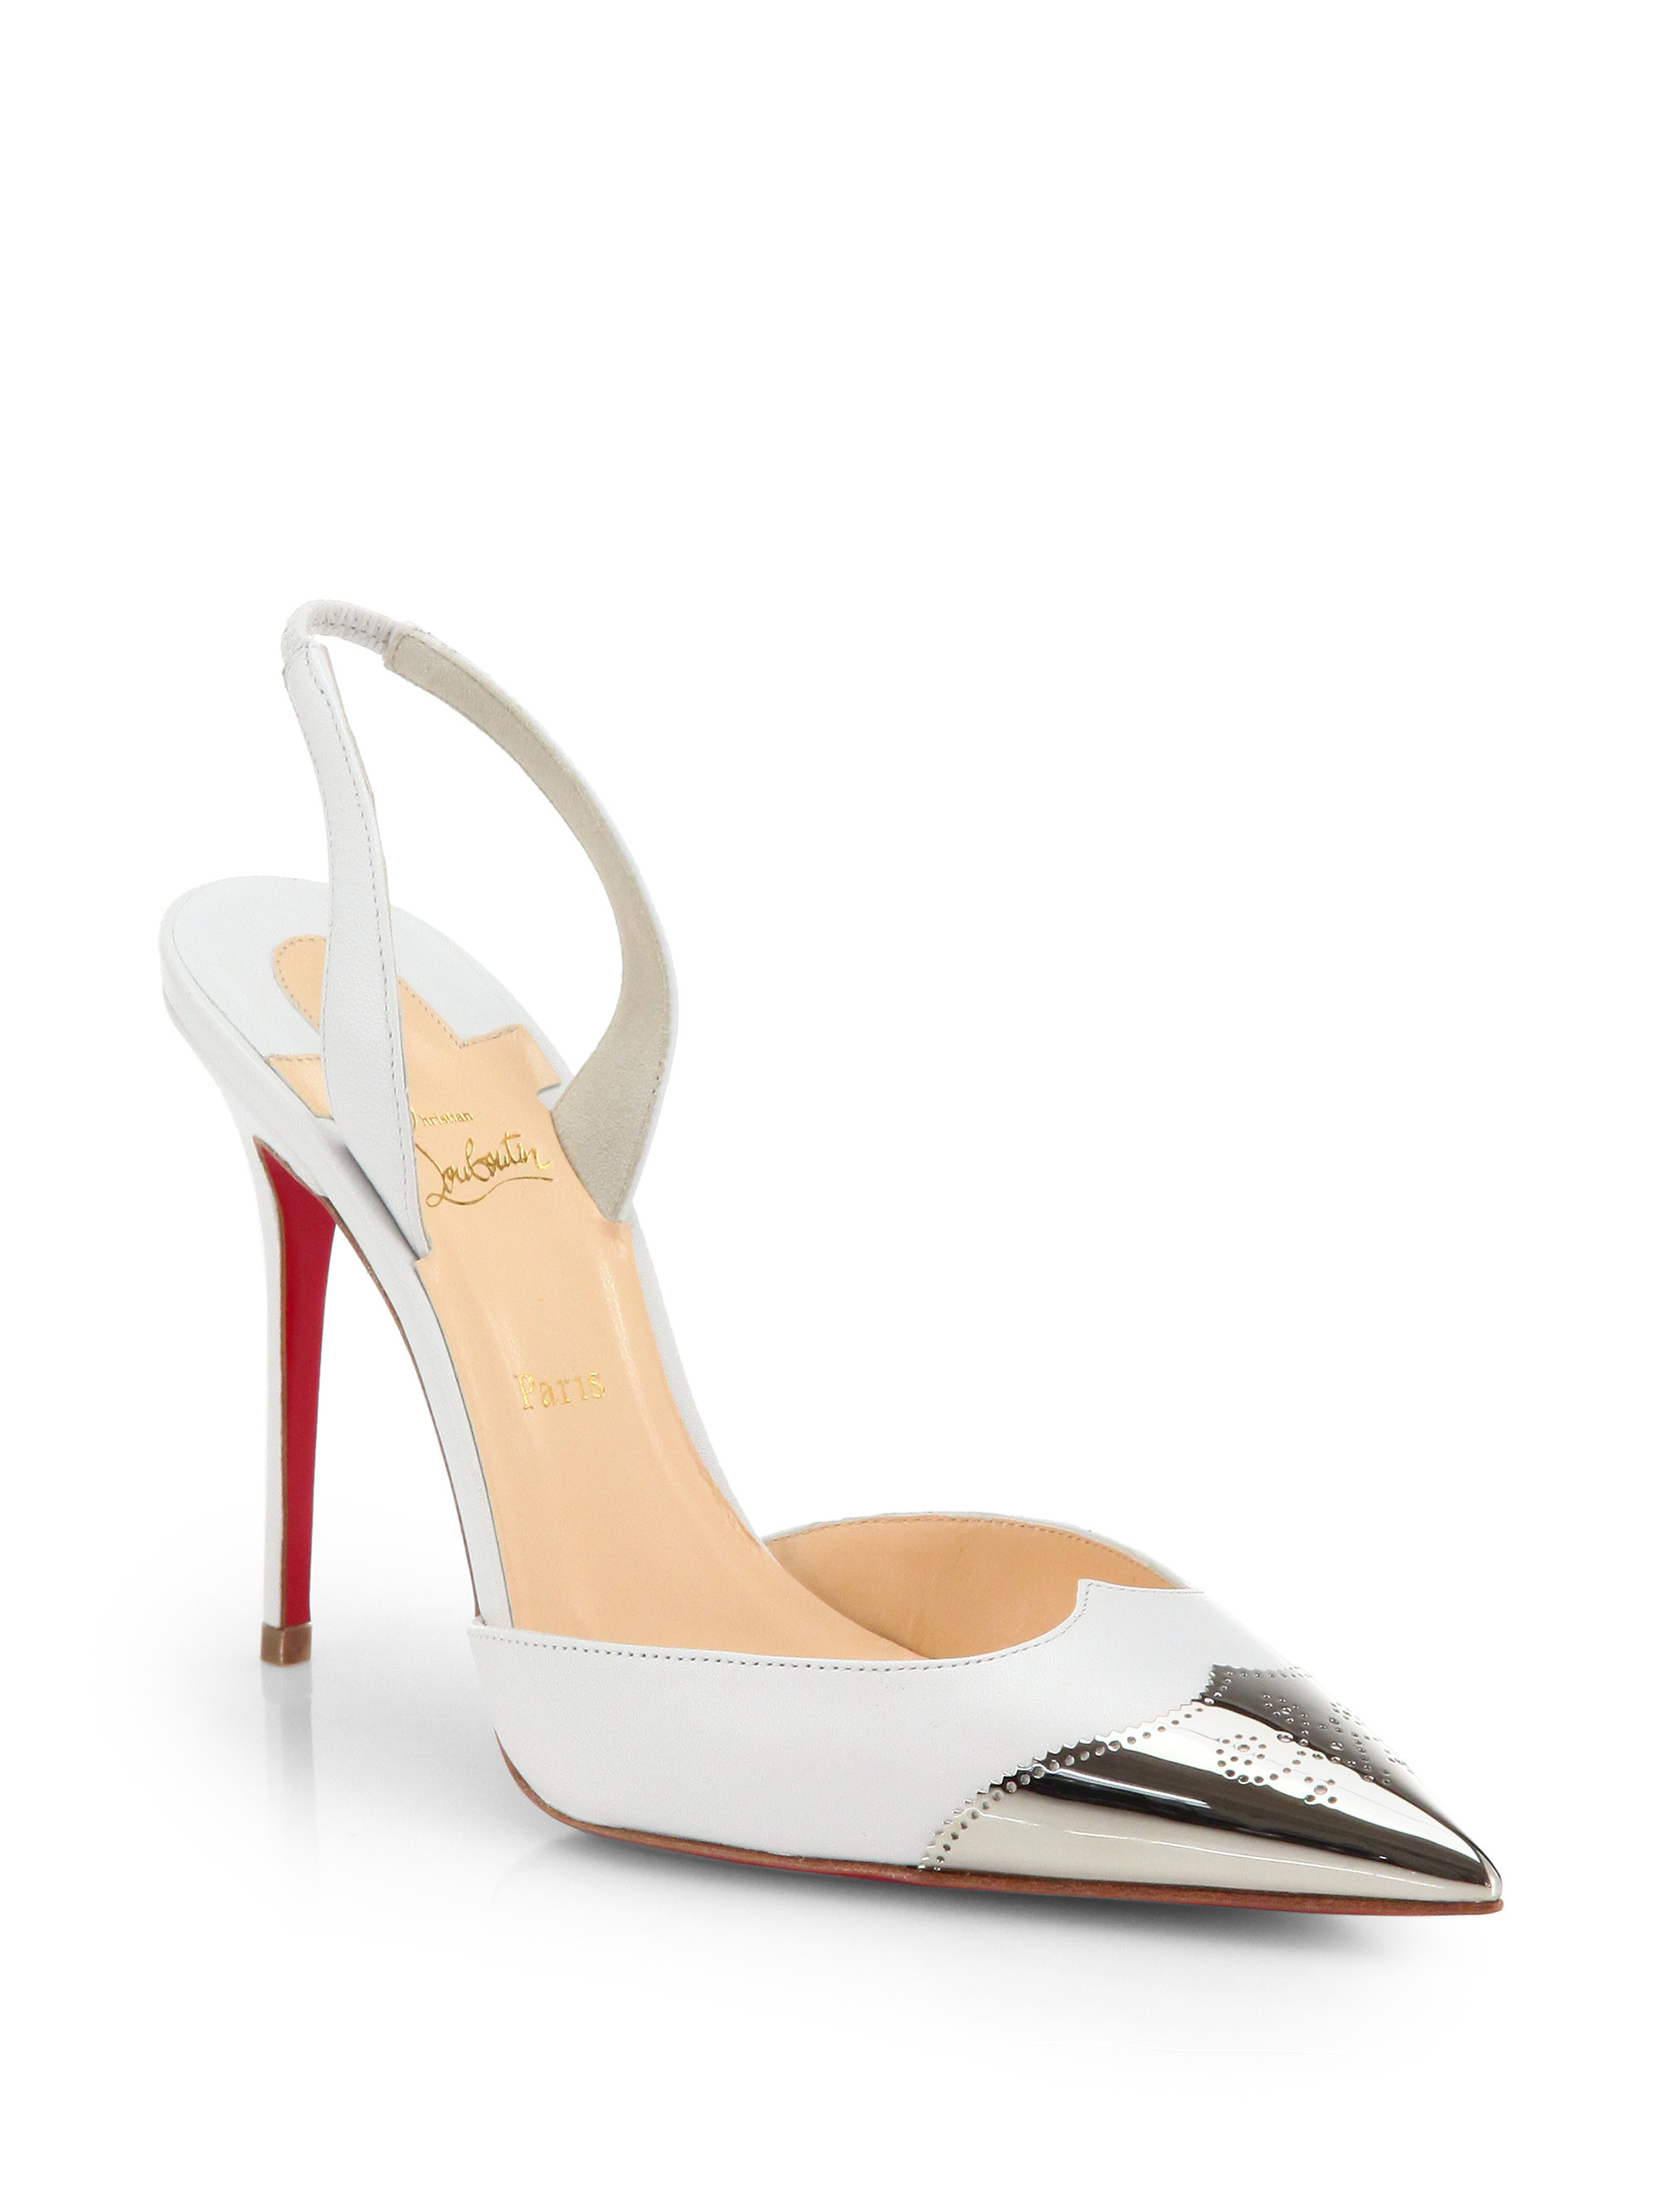 christian louis button shoes - christian louboutin slingback sandals White patent leather block ...